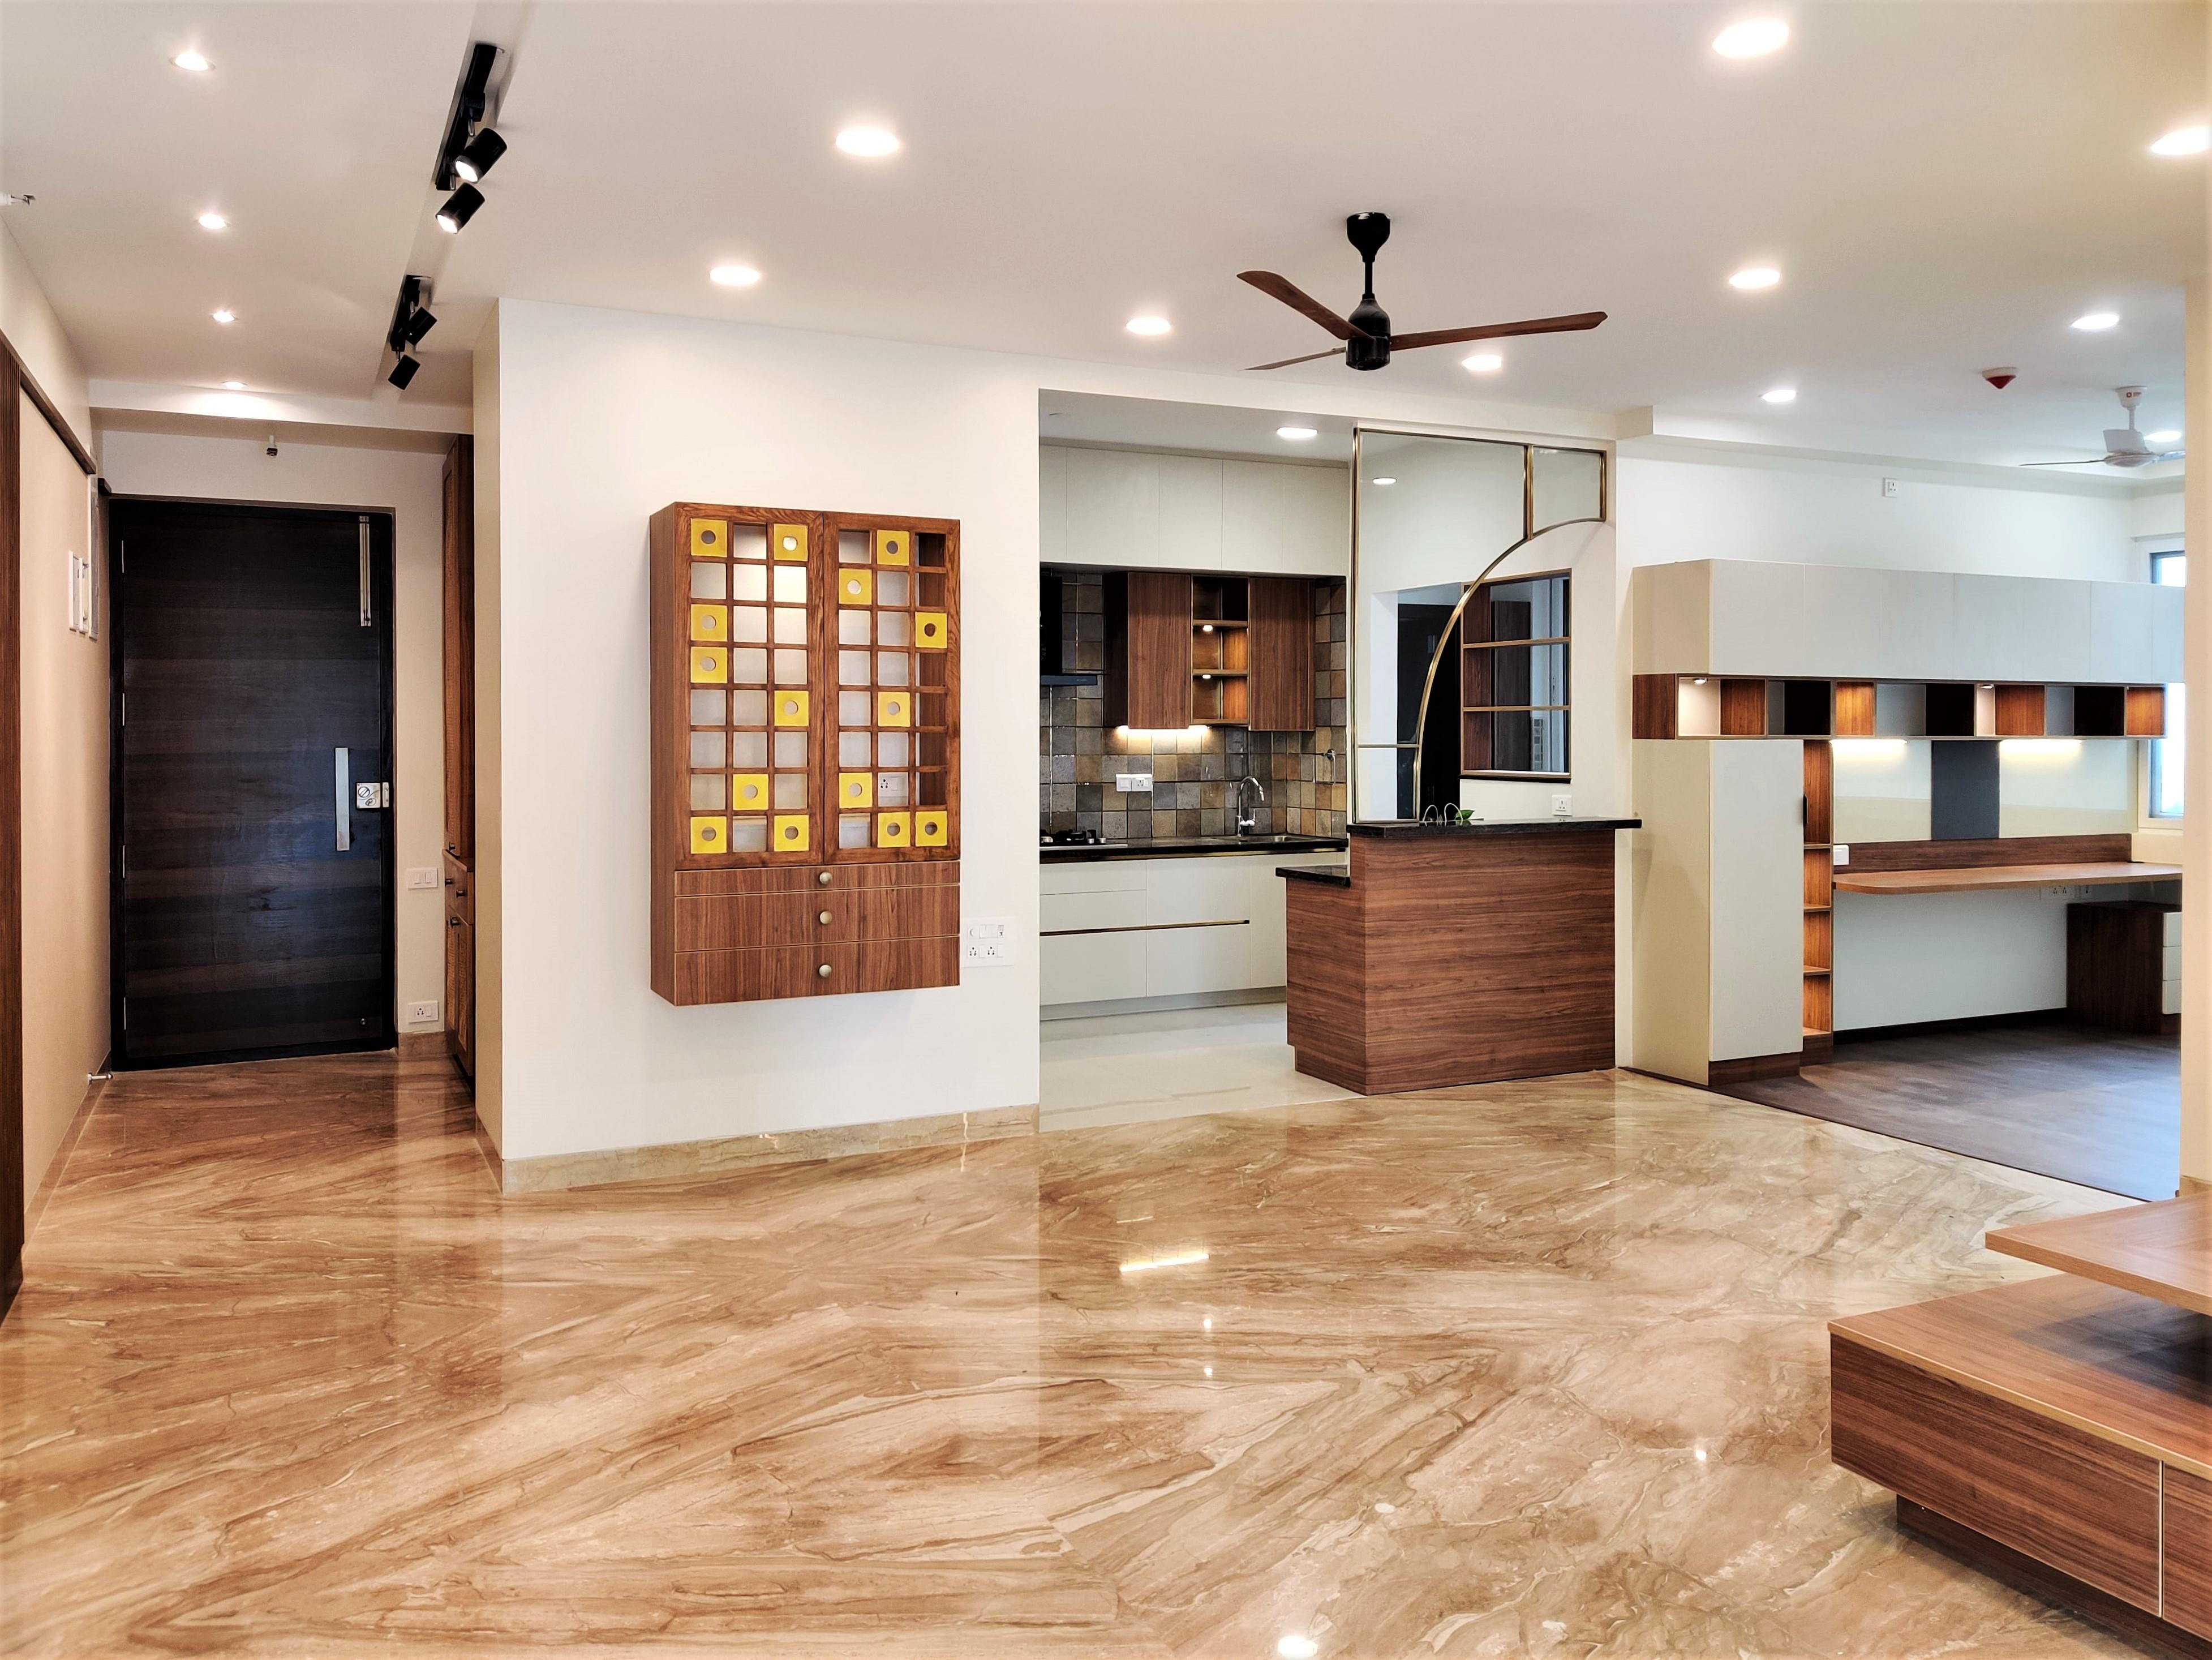 Home interiors in Bangalore